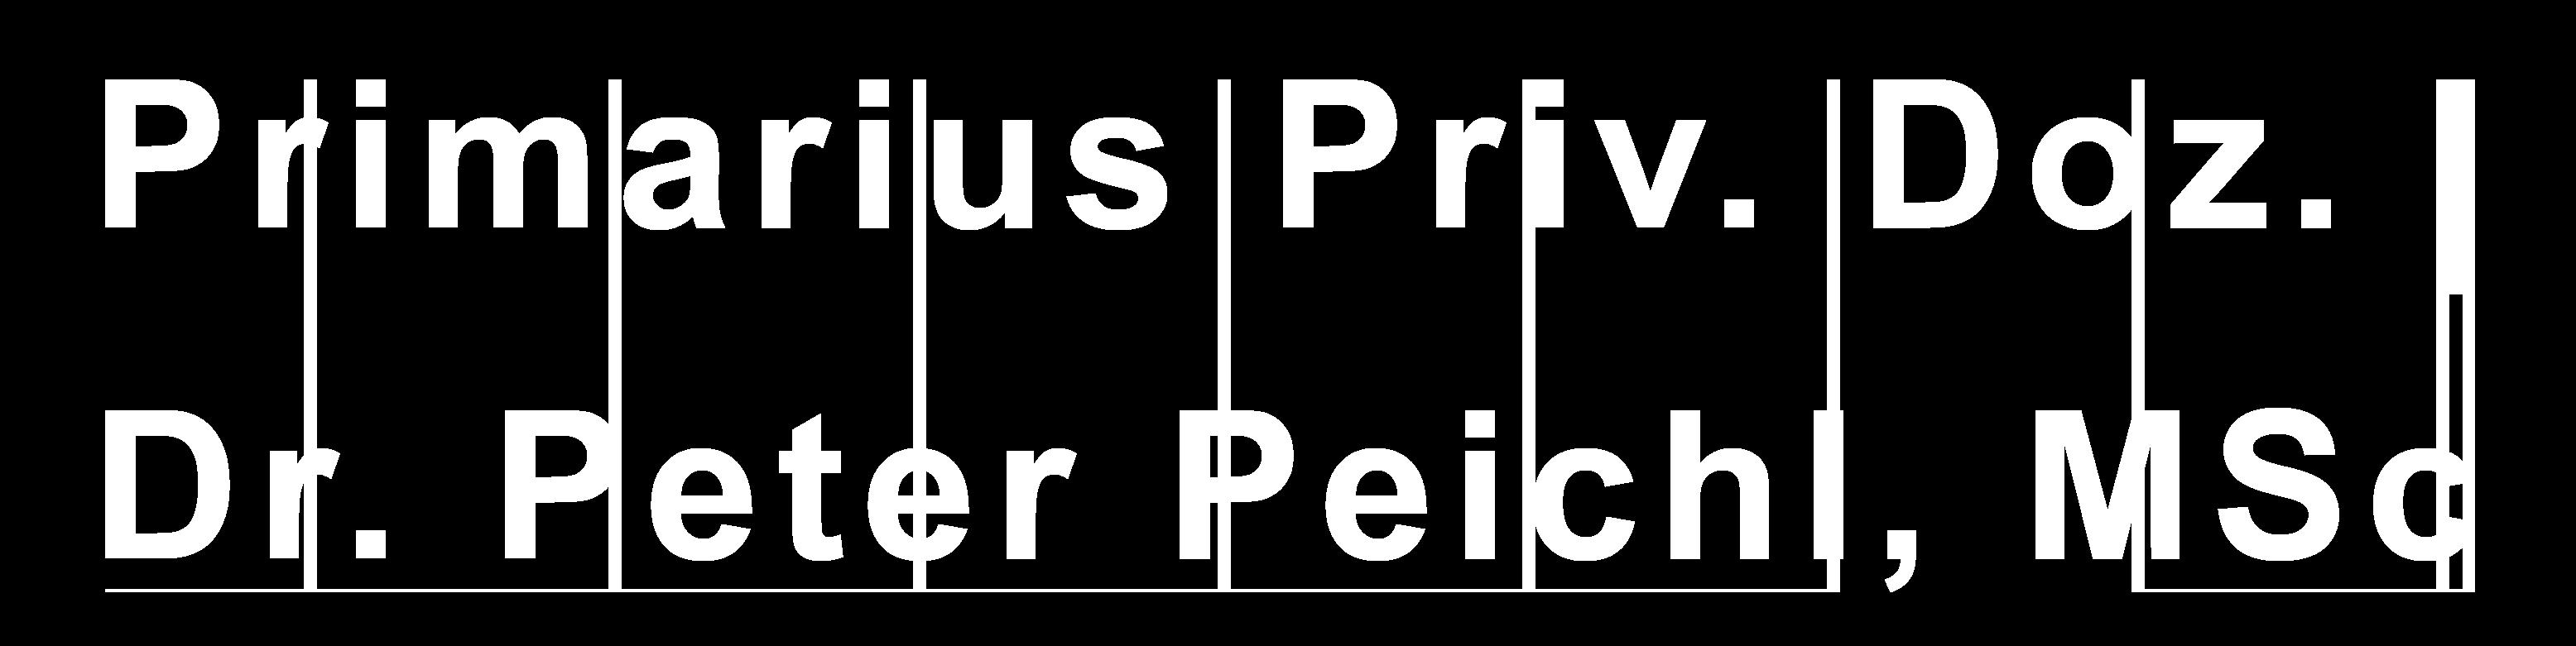 Dr. Peter Peichl